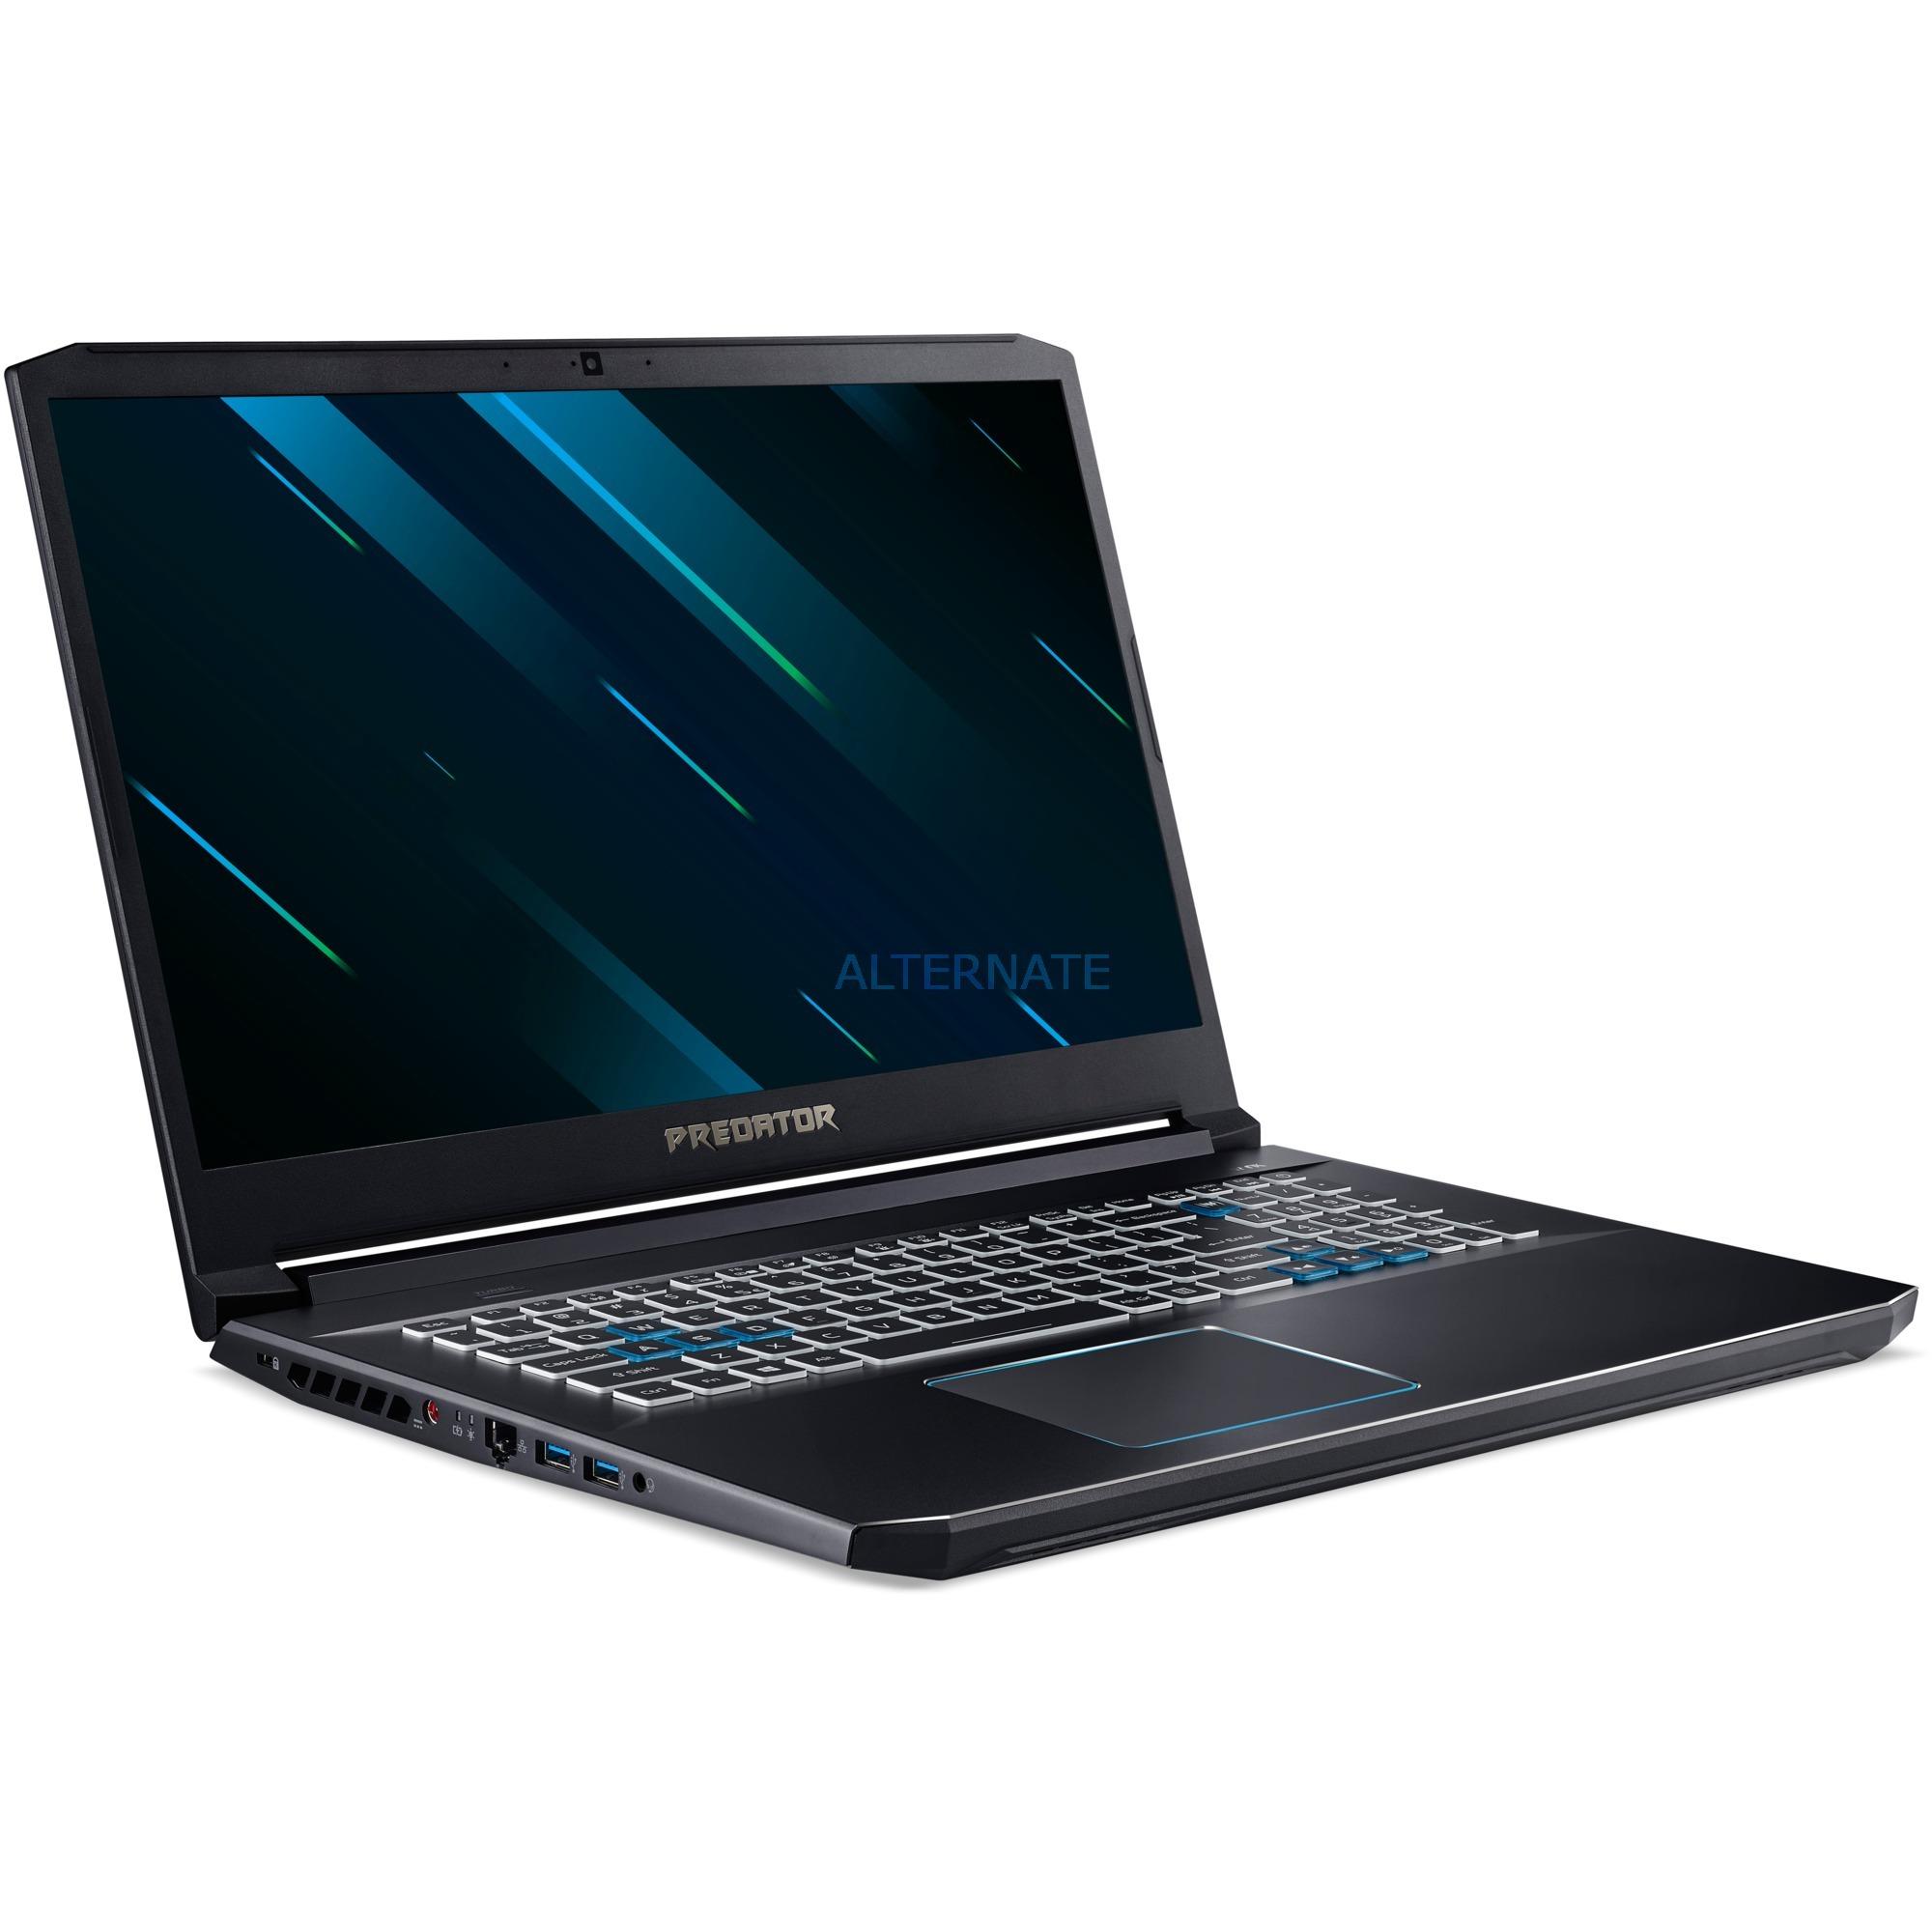 "Acer Predator Helios 300 PH317-53-73DV Gaming Notebook (17.3"", Core i7, 16GB DDR4, GeForce GTX 1660 Ti, 1TB SSD)"